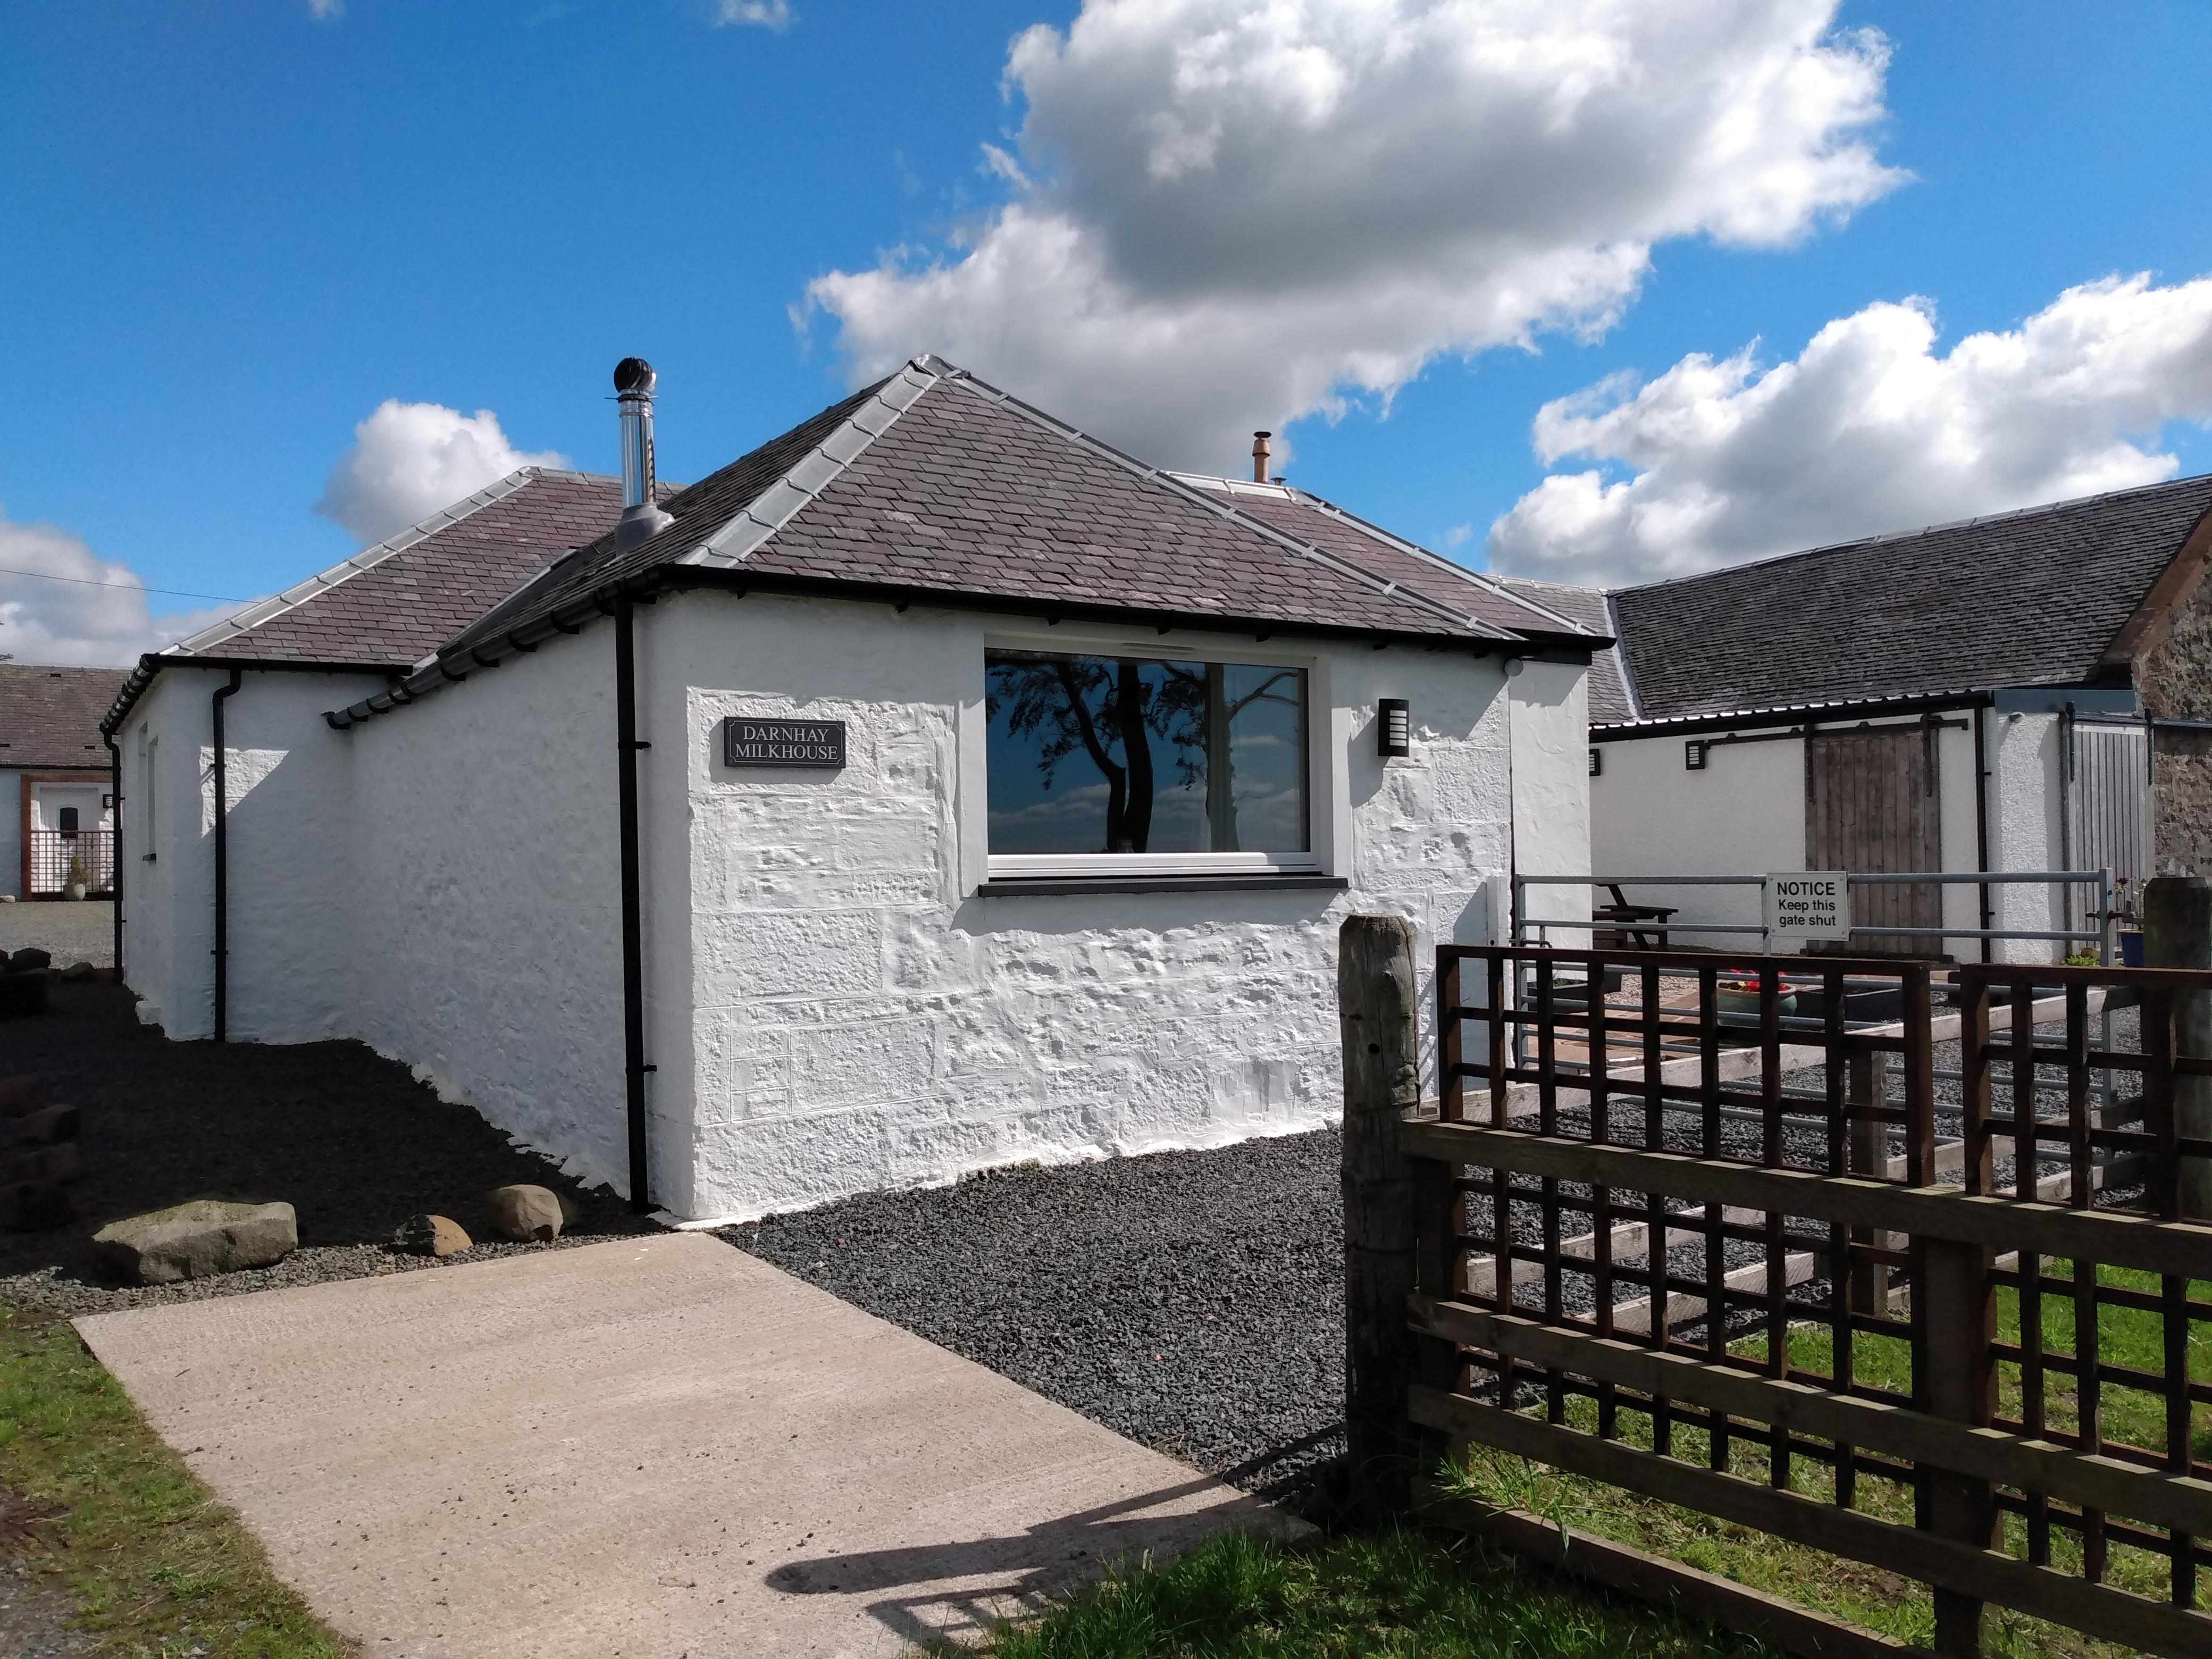 Darnhay Milkhouse9